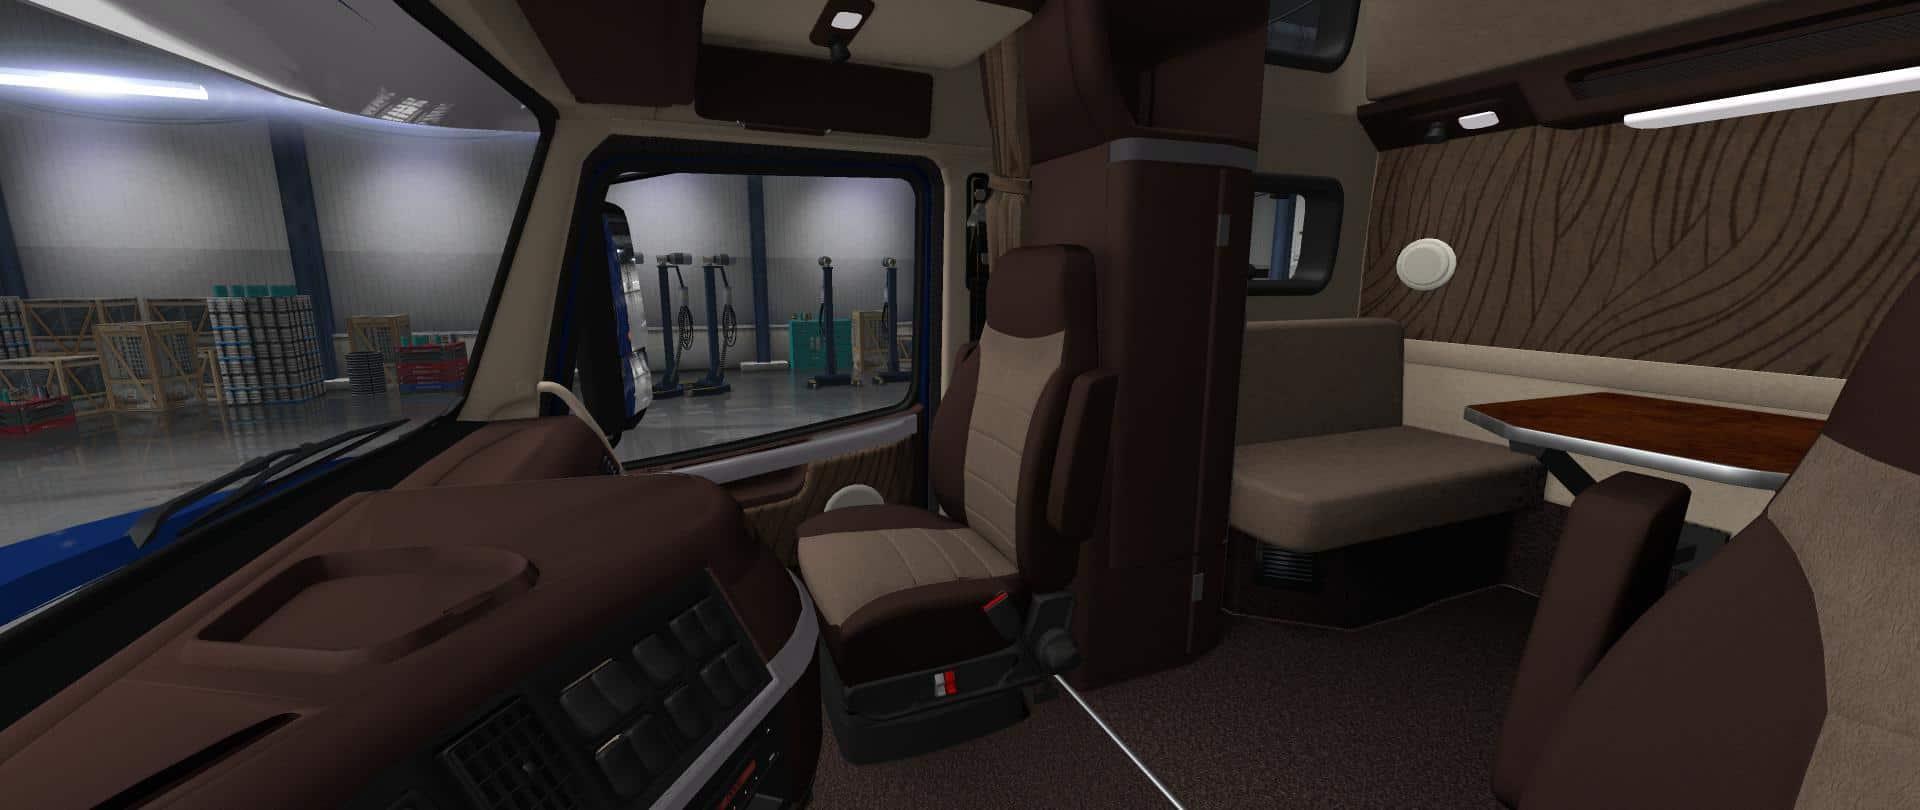 VOLVO VNL TRUCK SHOP UPD 26.04.18 (1.31) ATS - American Truck Simulator mod | ATS mod